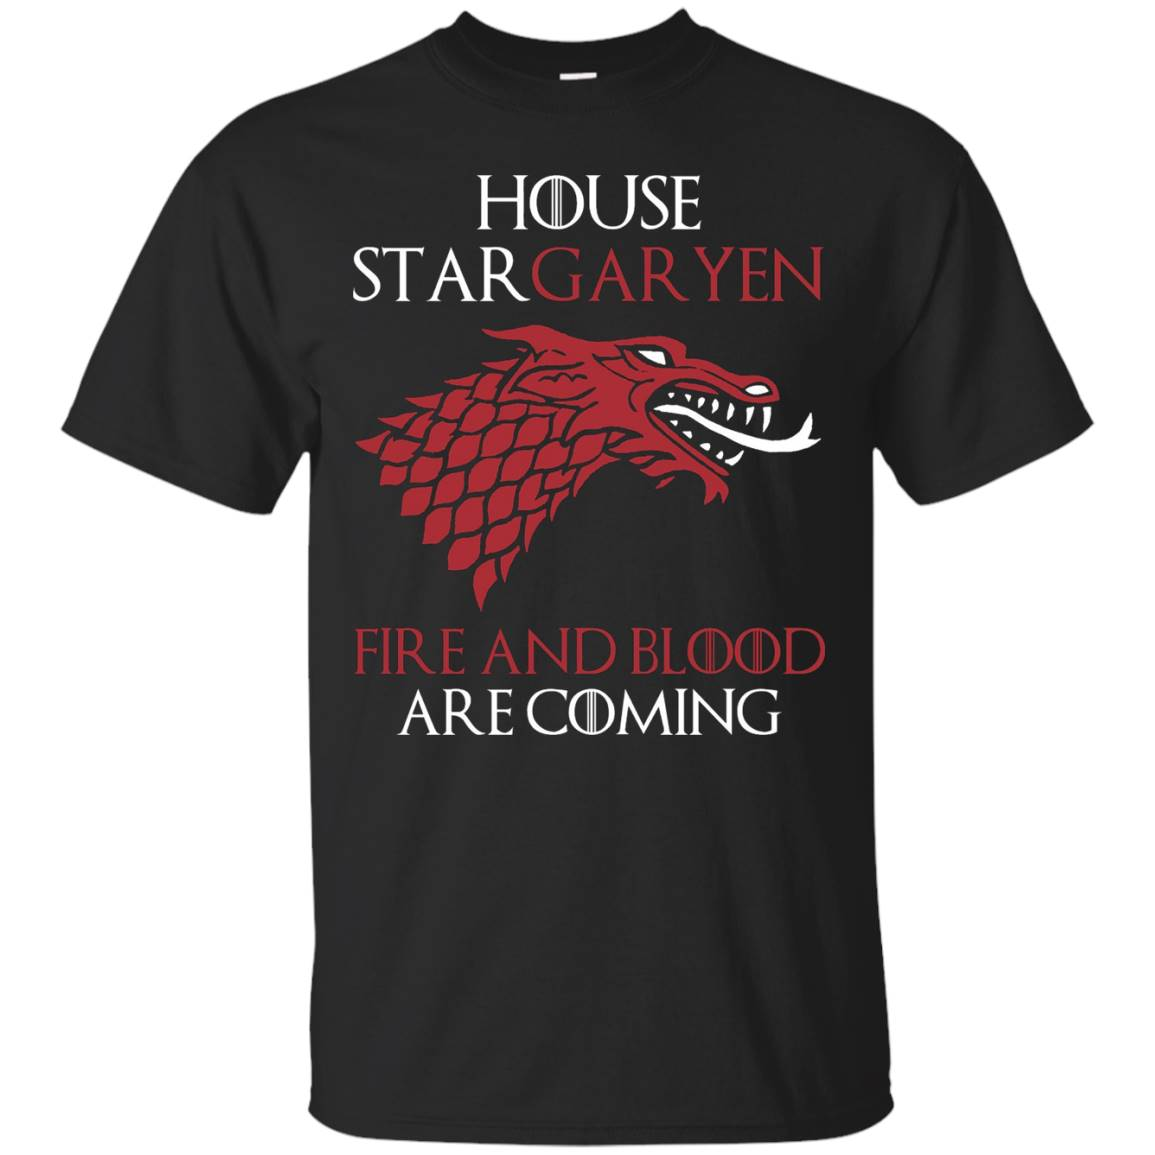 House StarGaryen Tshirt